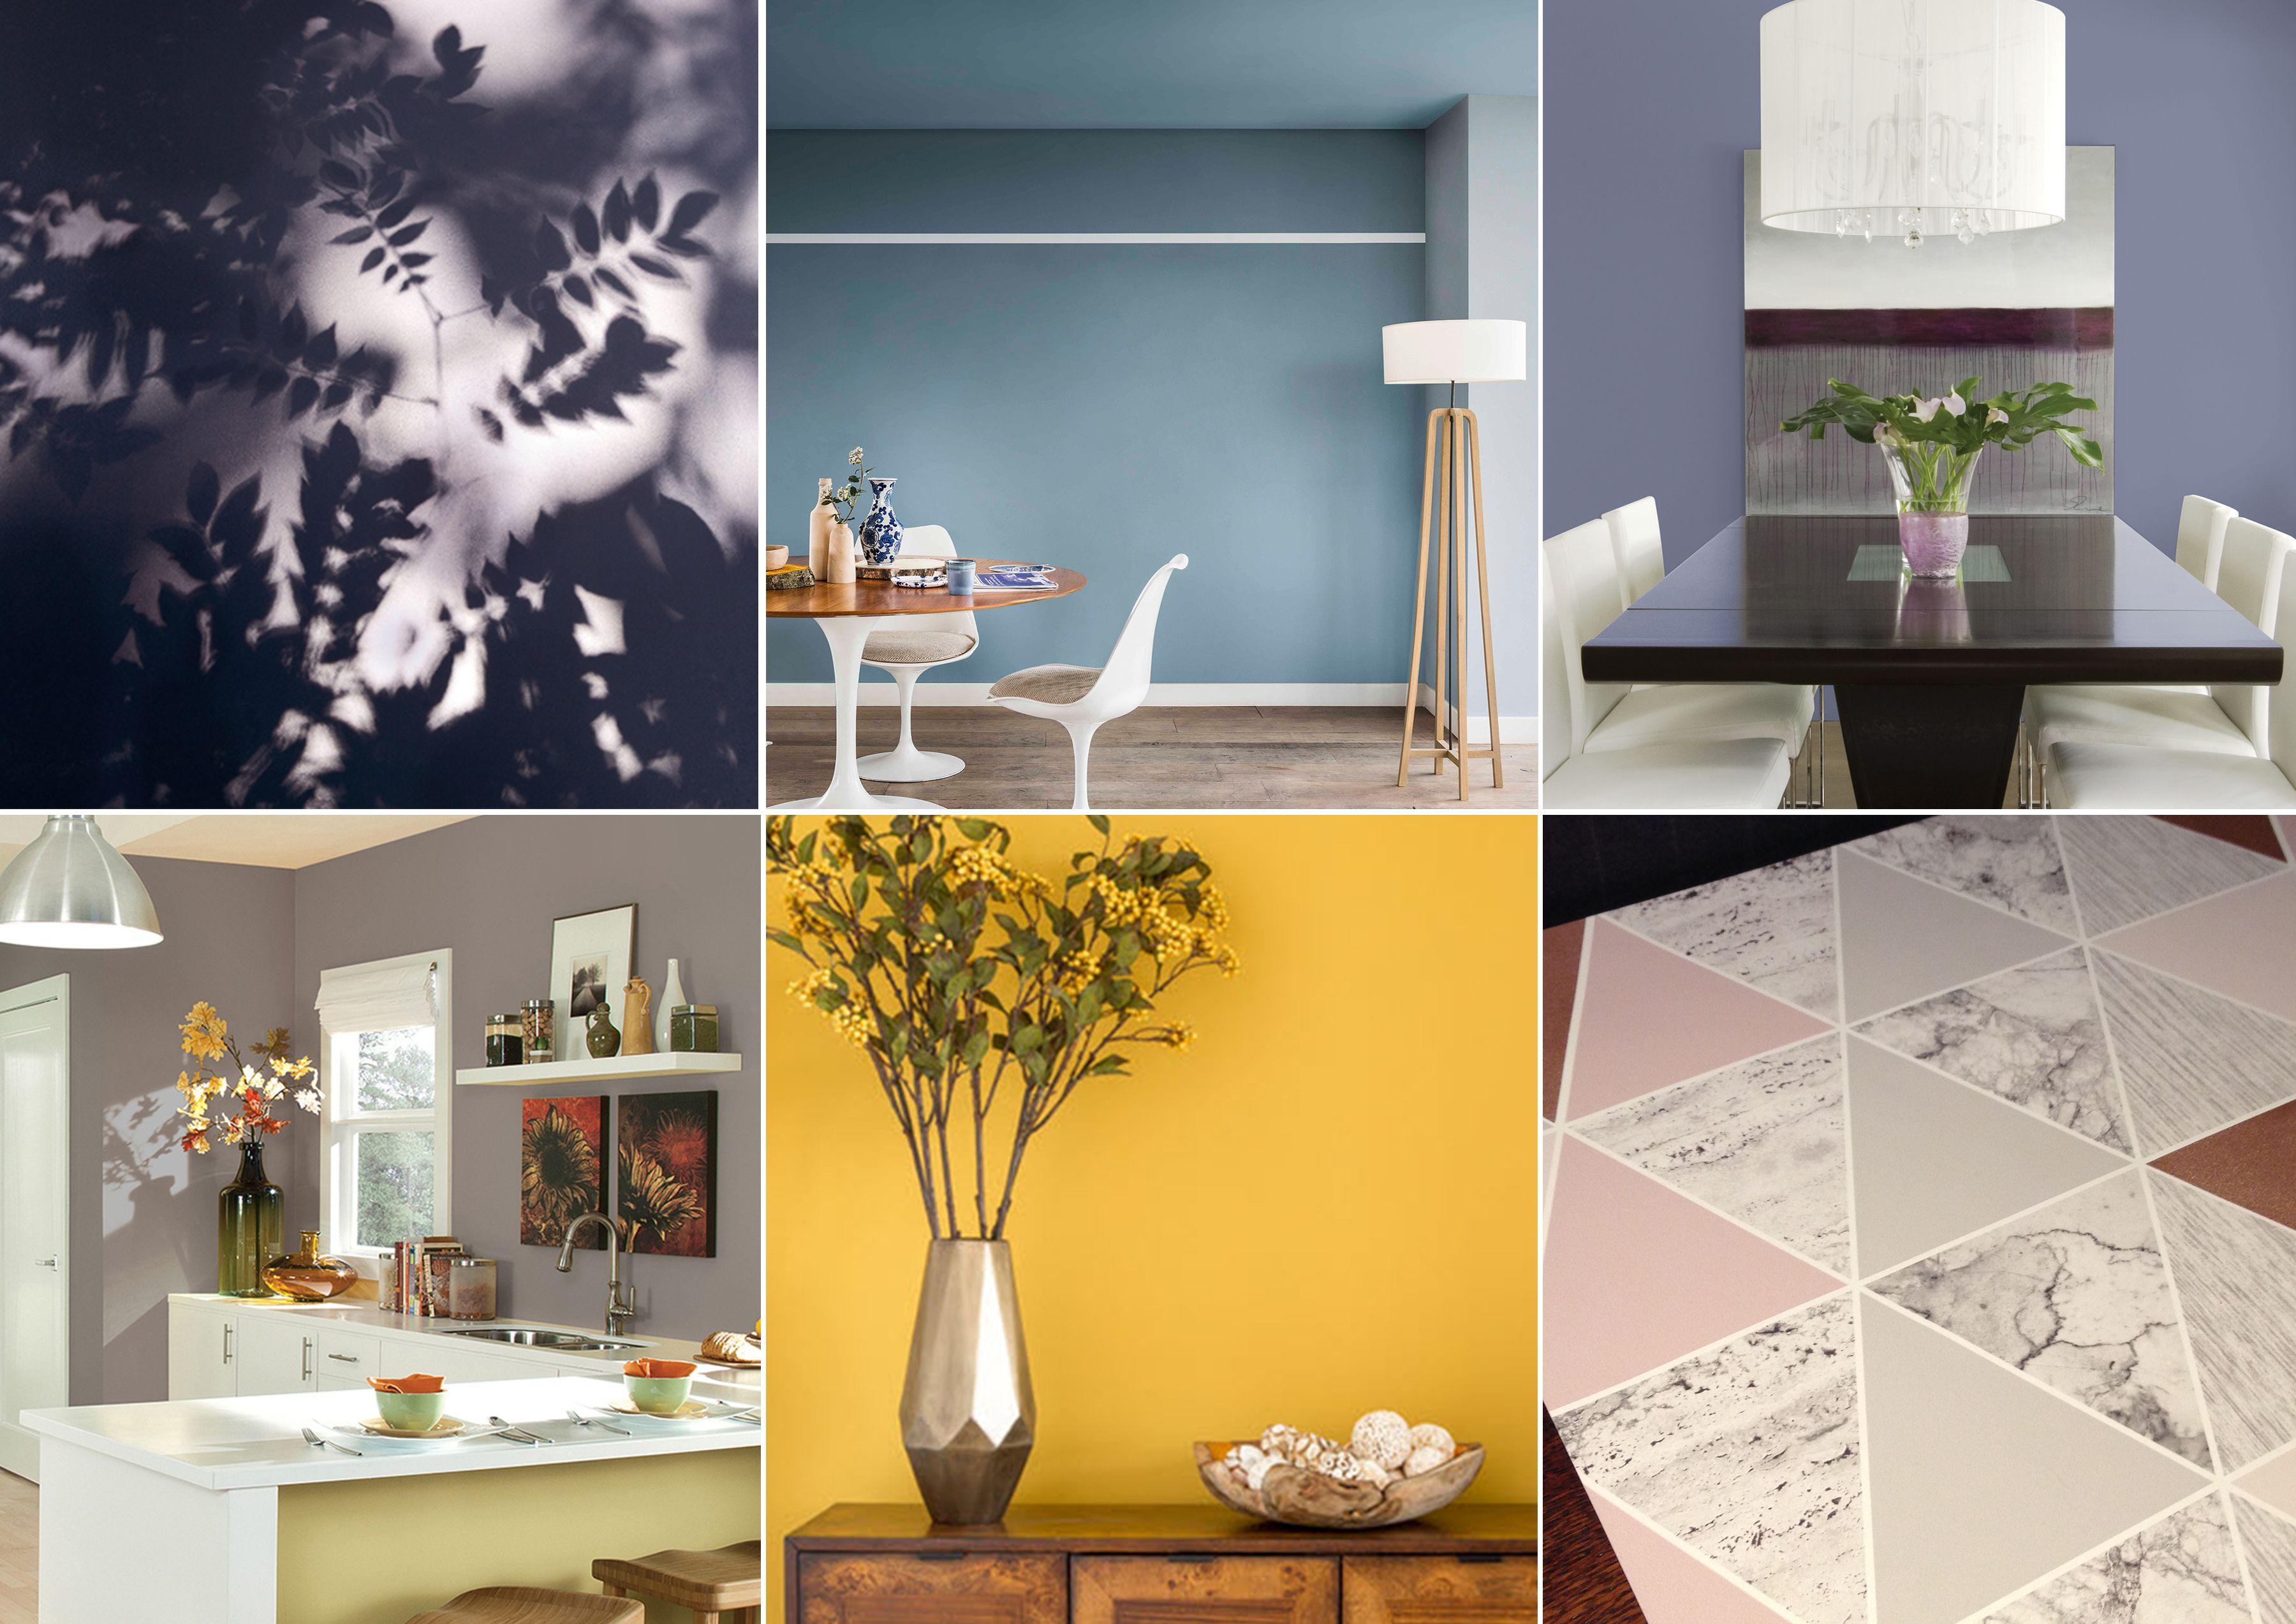 Interior Design Colour Trends: The New Hues for 2017 via ...